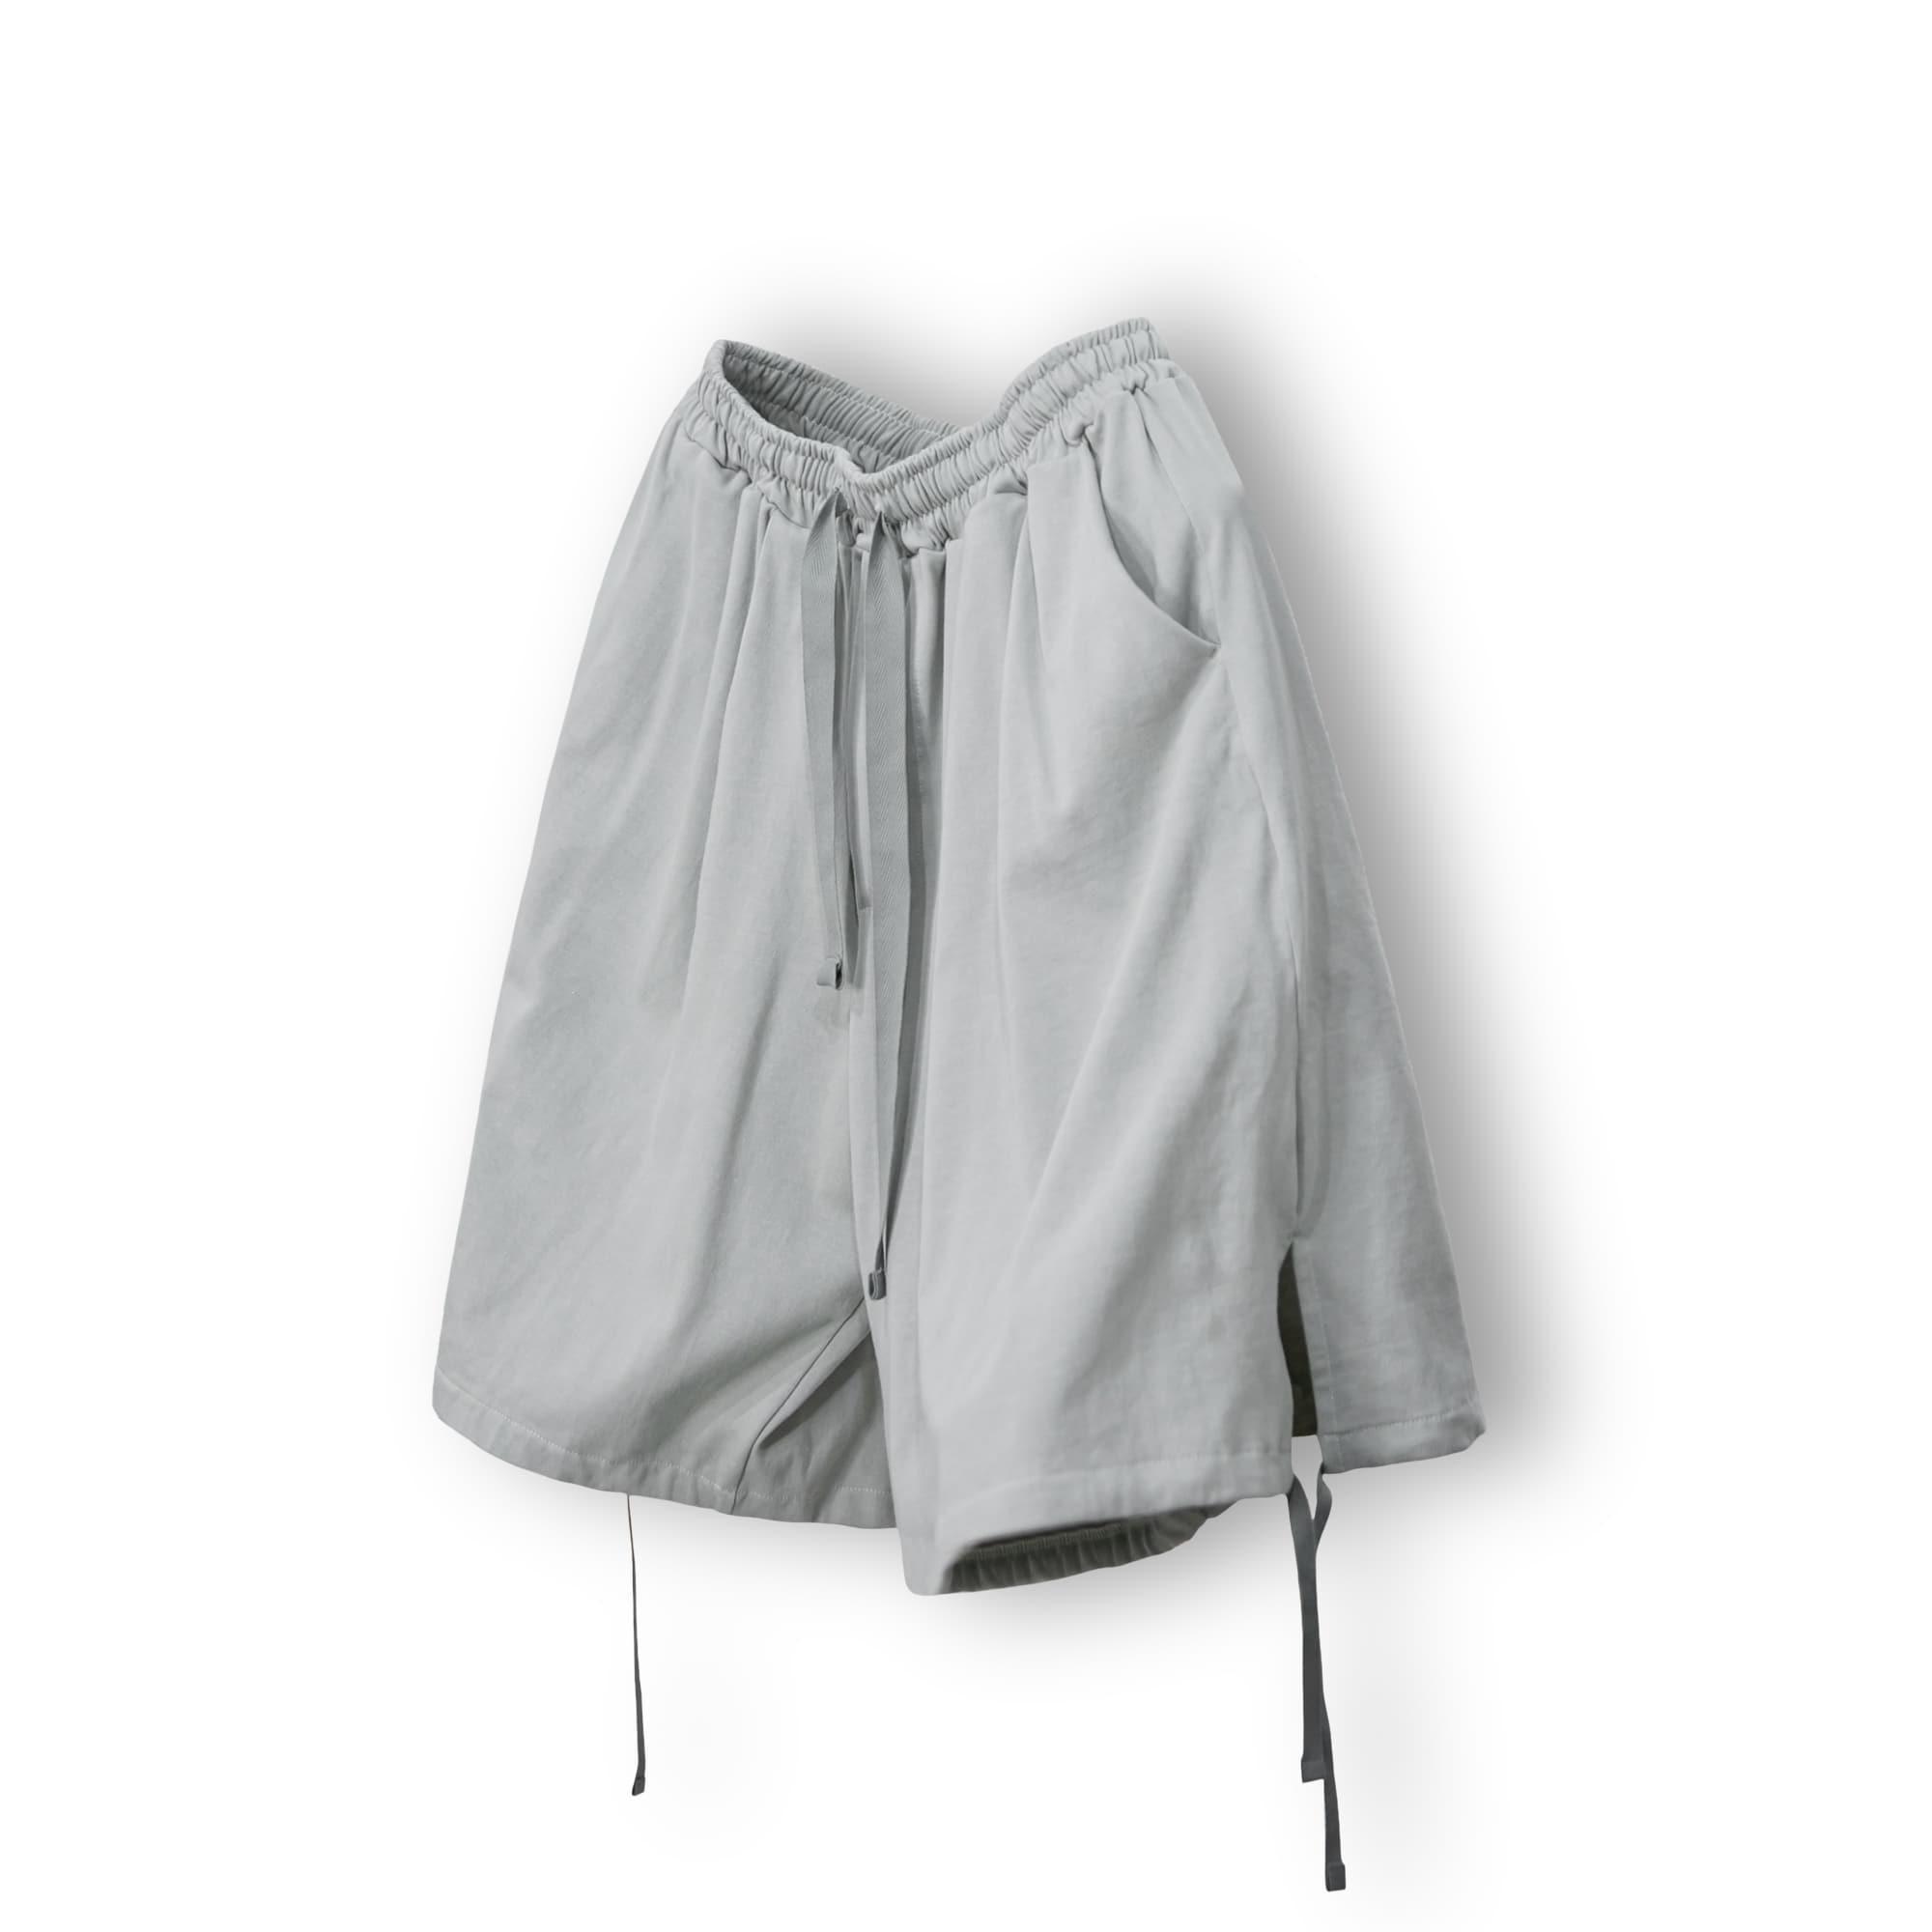 Strap Banding Half Pants - Grey